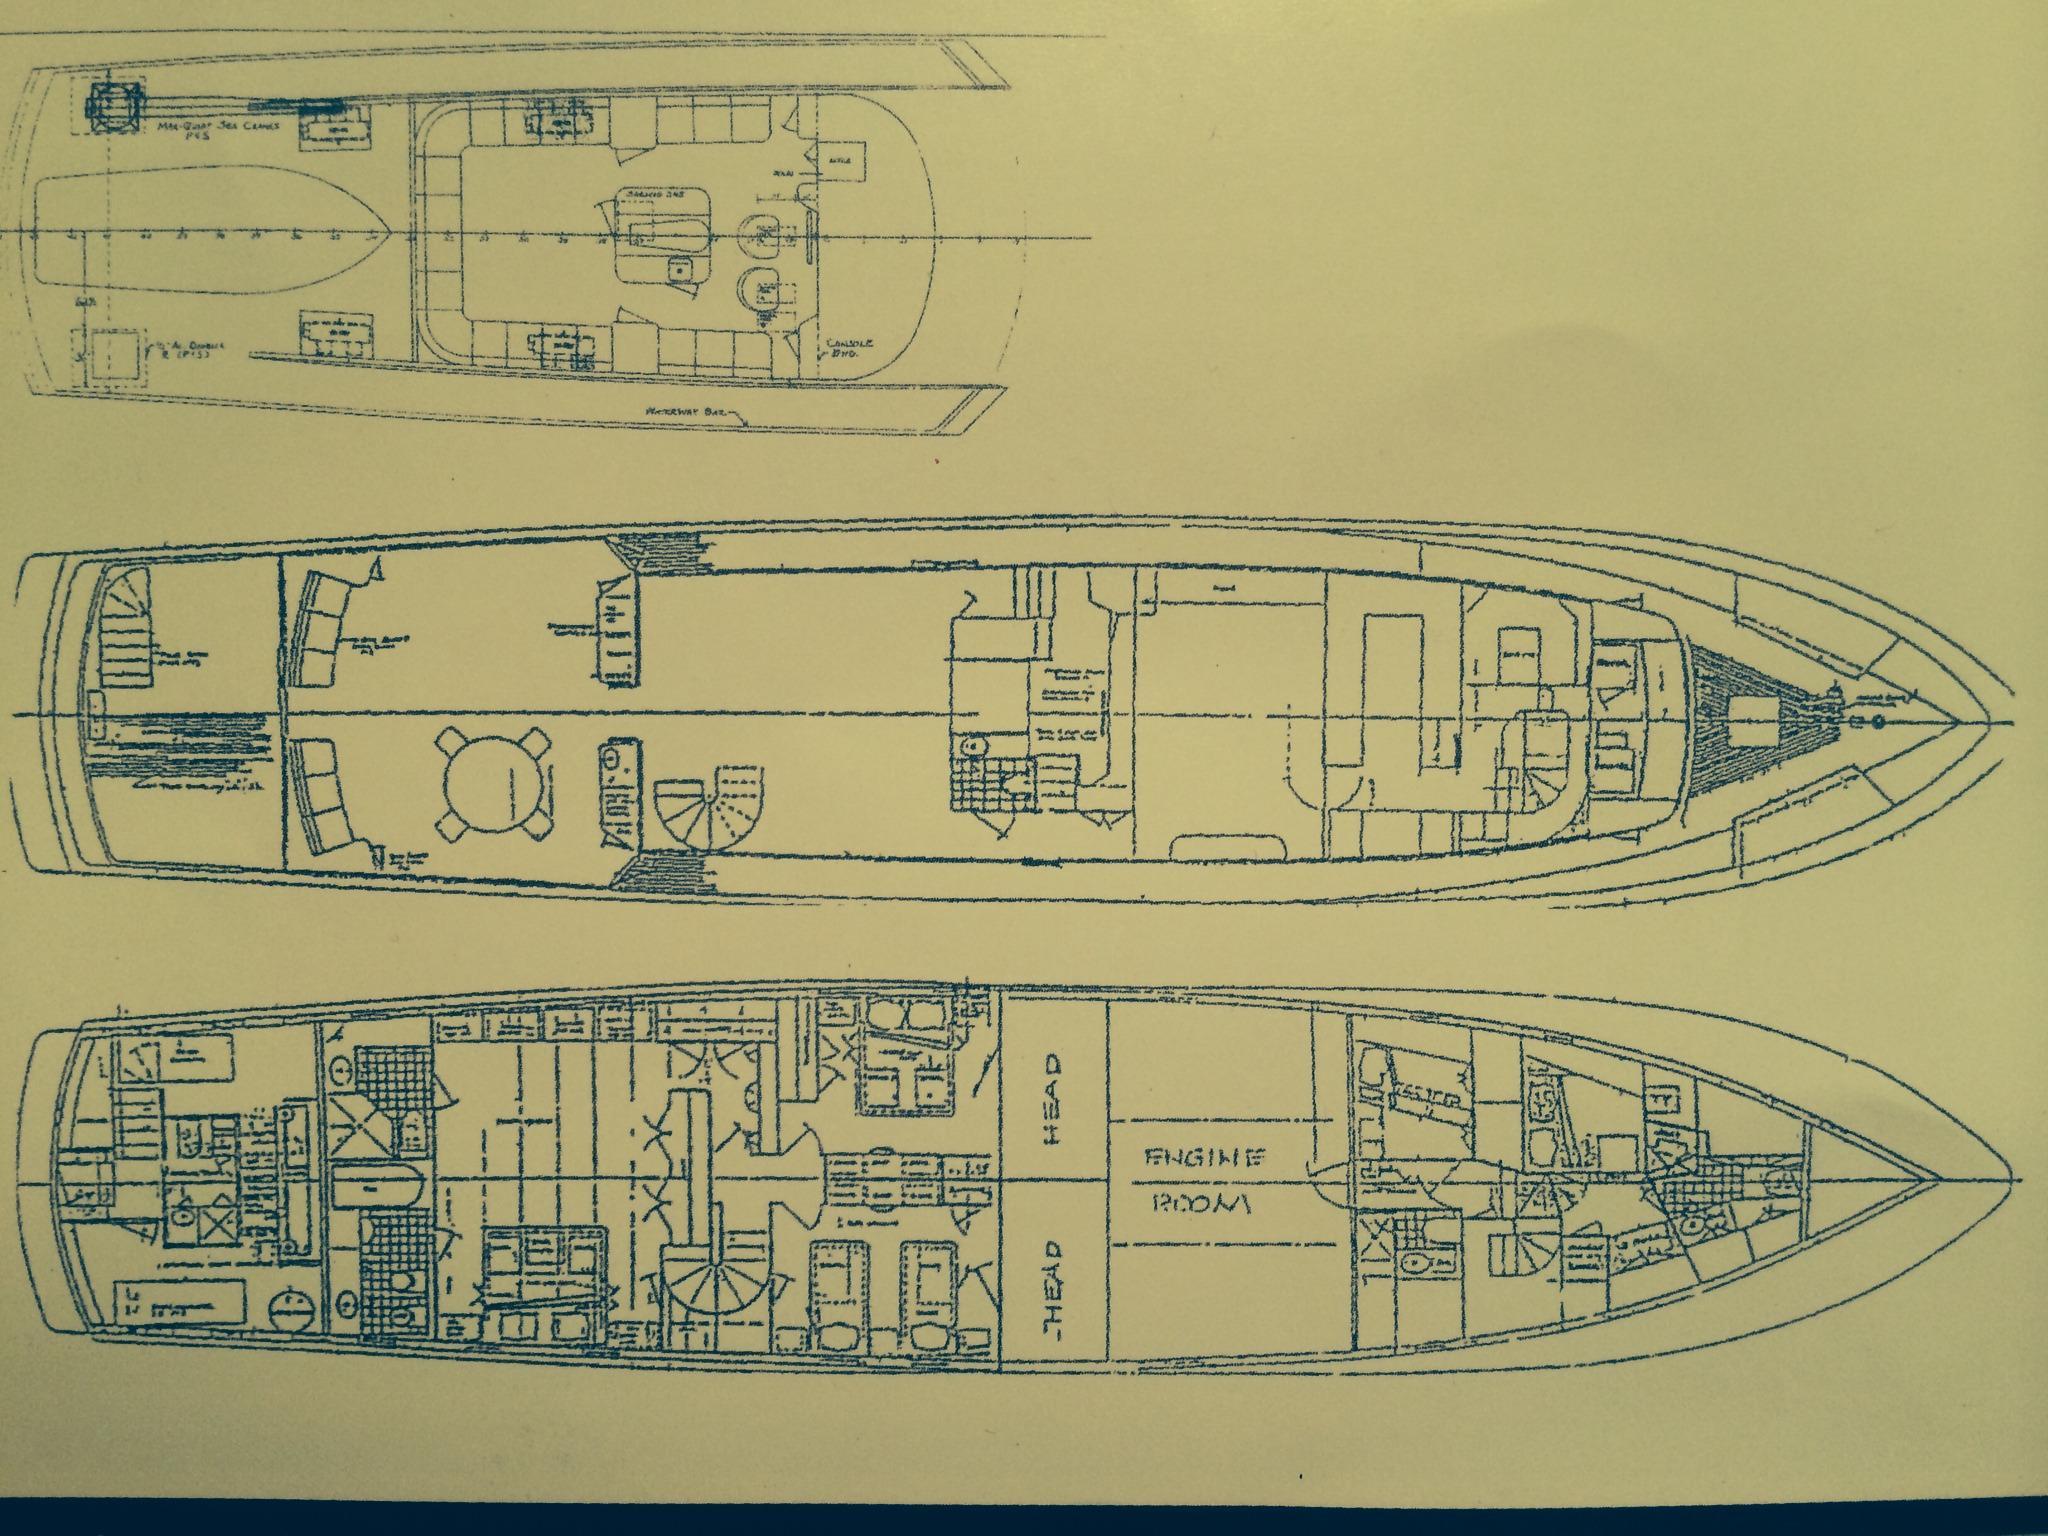 106 denison zantino iii 1986 palm beach denison yacht sales for Palm beach electric motors